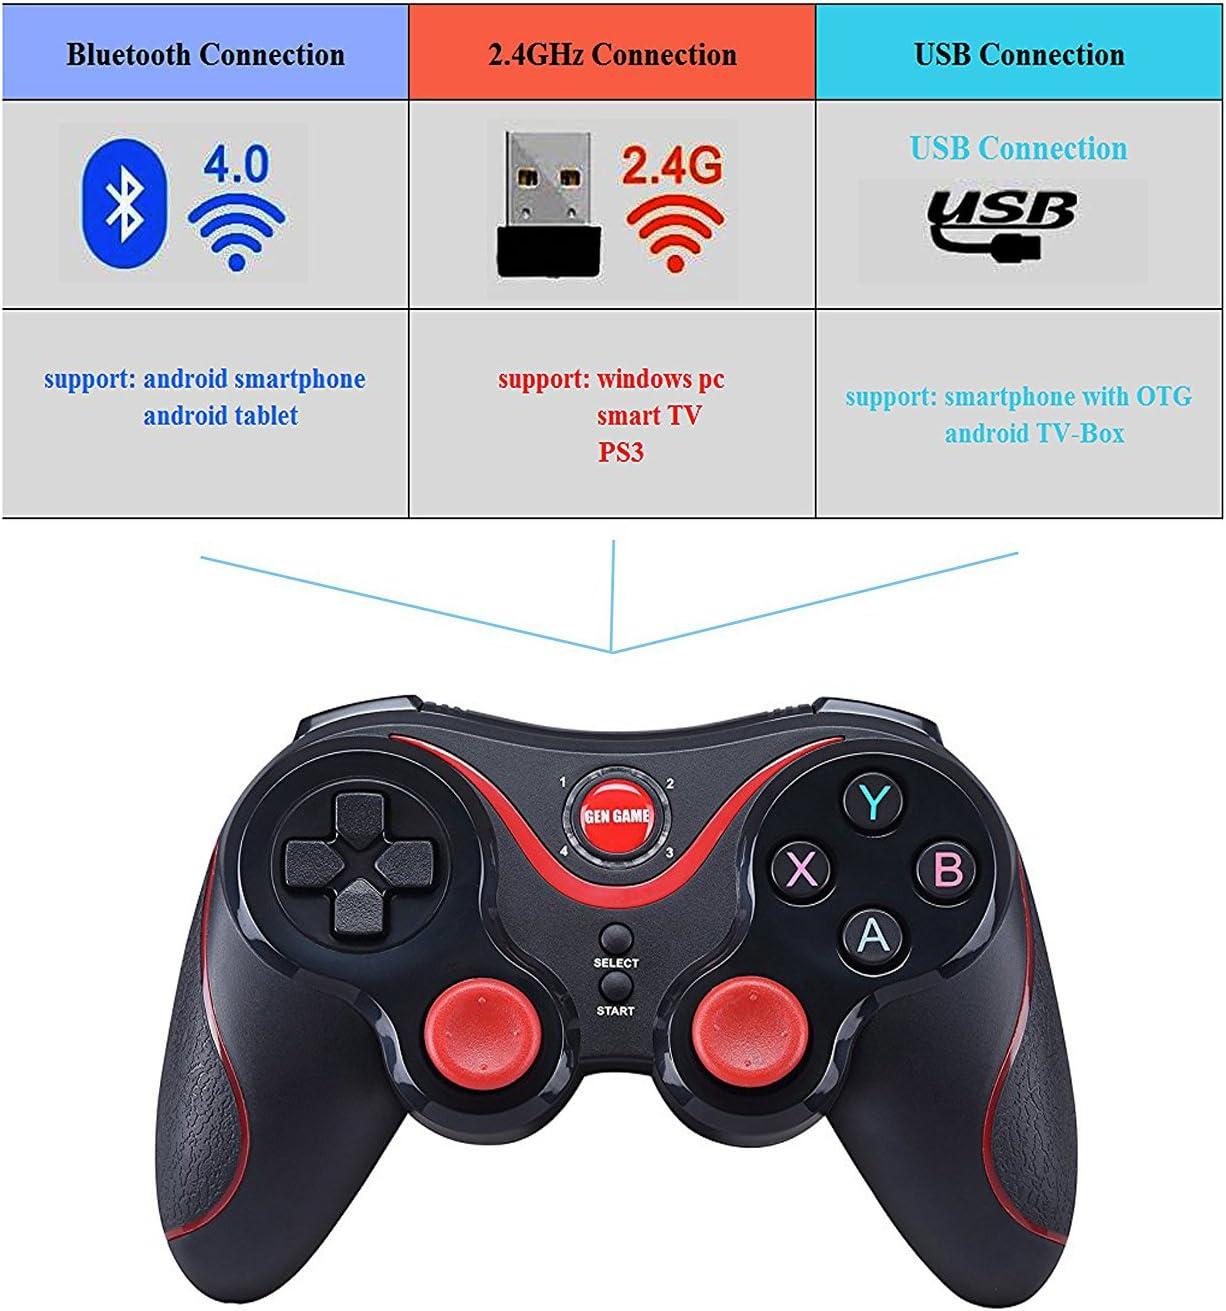 Maegoo Mando Inalámbrico para Juegos, 2.4GHz Bluetooth Game Controller Gamepad Joystick Inalámbrico con Soporte de Teléfono para Android Smartphone Xiaomi Huawei Samsung PC Windows PS3 Smart TV etc.: Amazon.es: Videojuegos